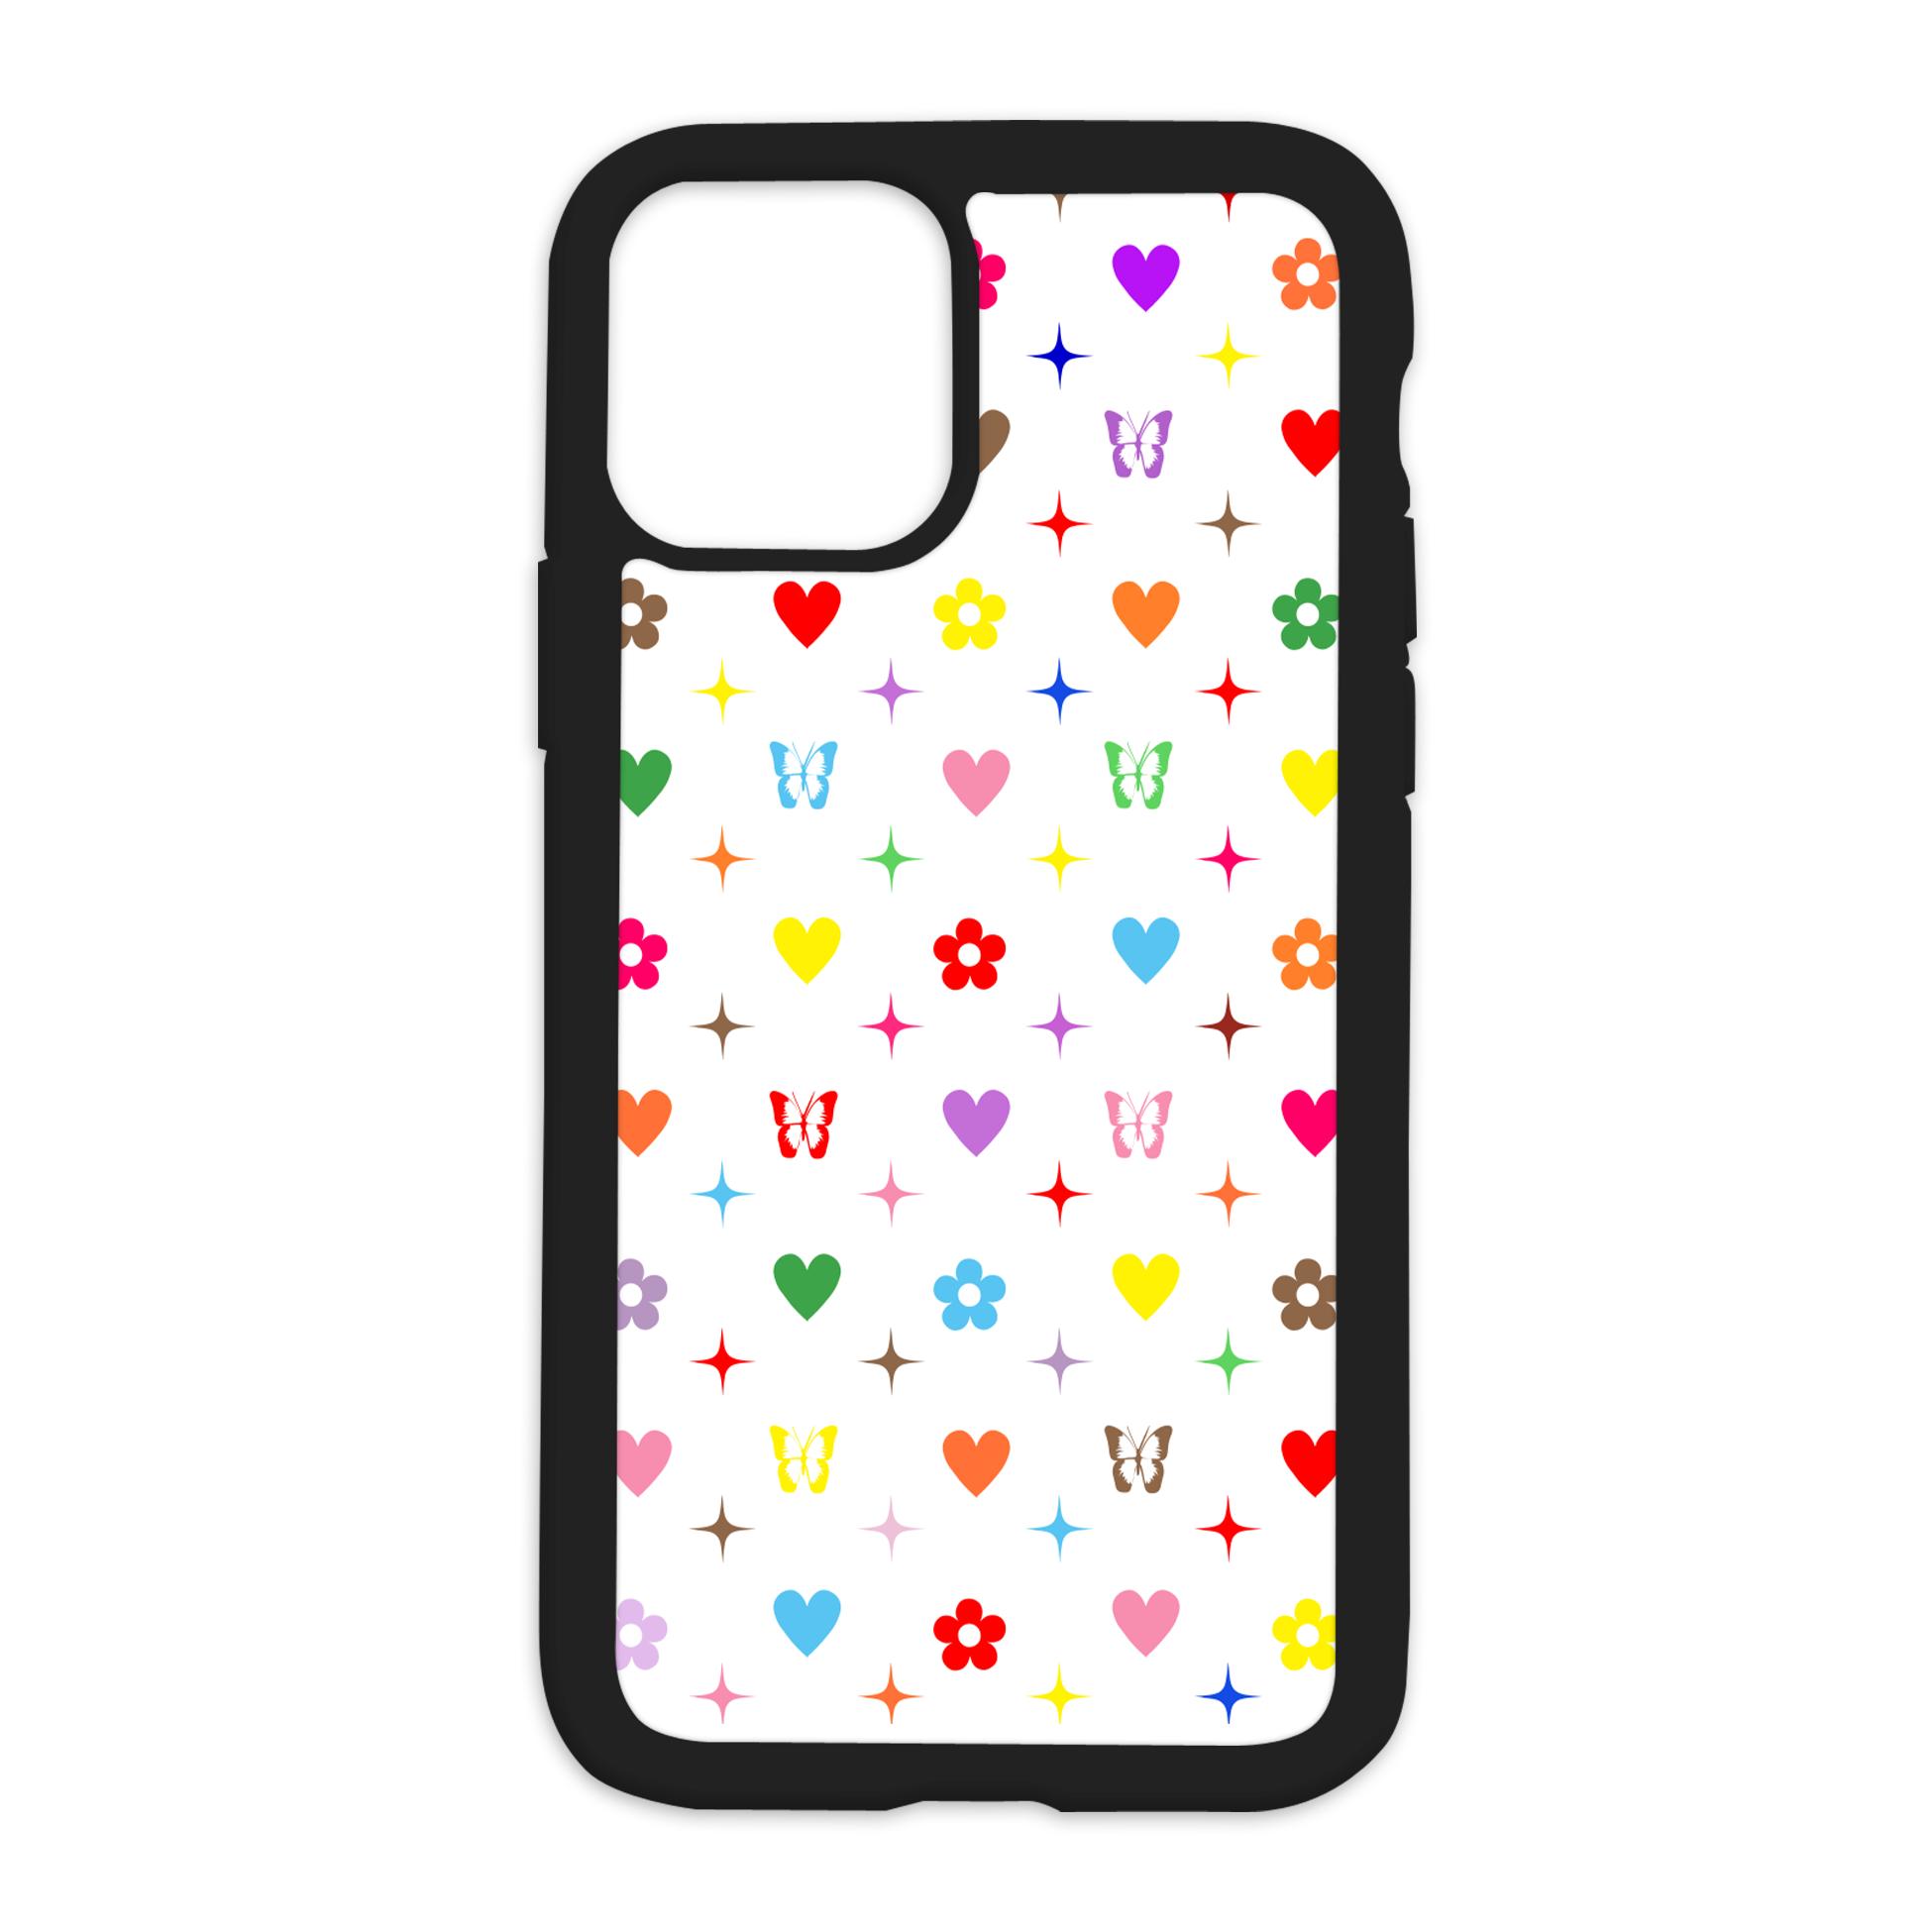 Colorful Vibez Design On Black Phone Case - 11 Pro Max